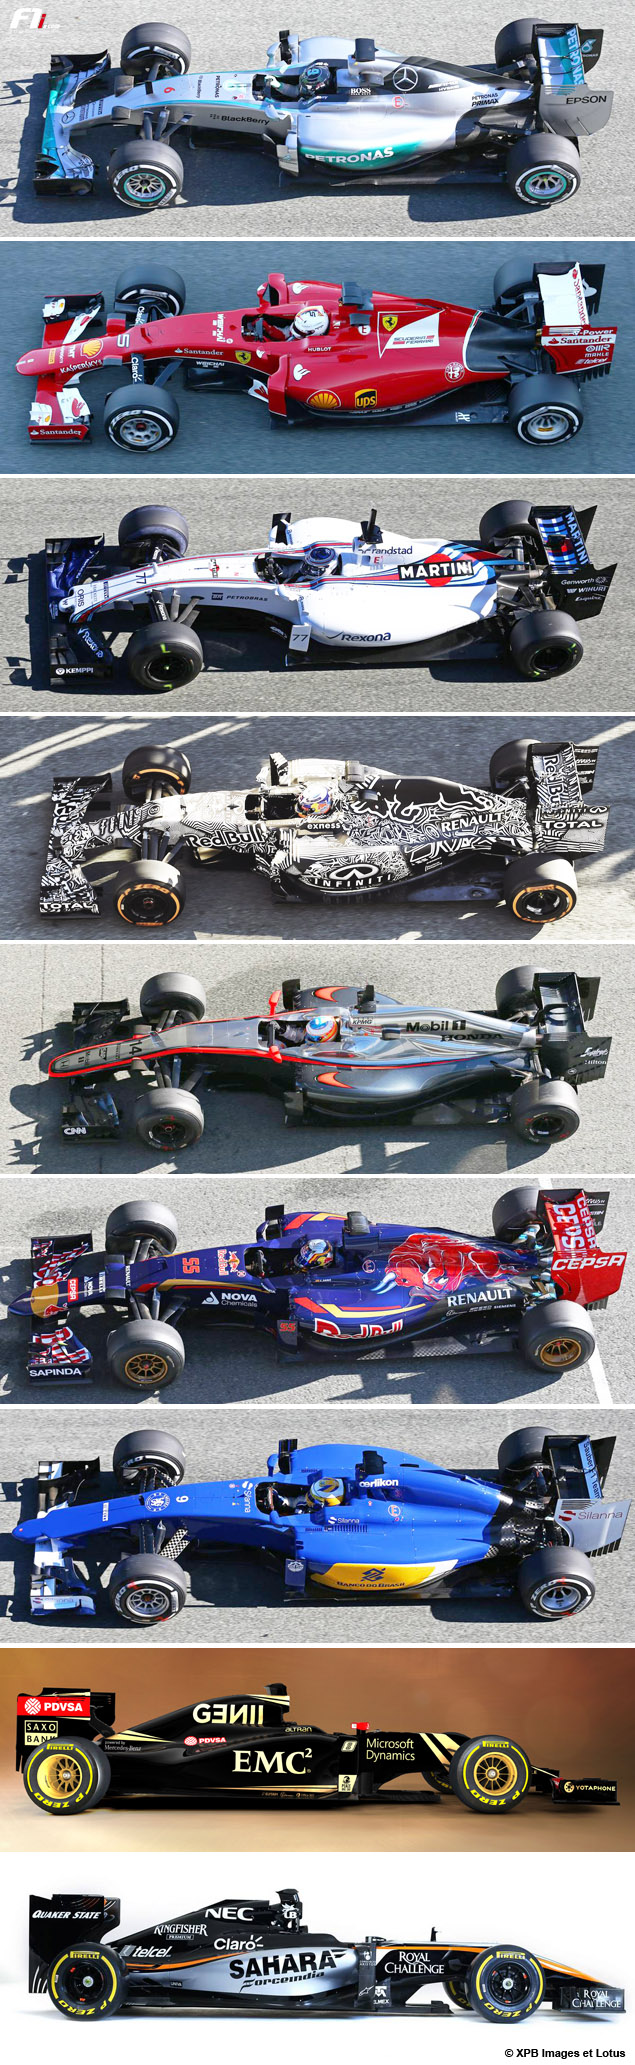 2015 F1 cars - Formula One Testing - Day 1 - Jerez, Spain